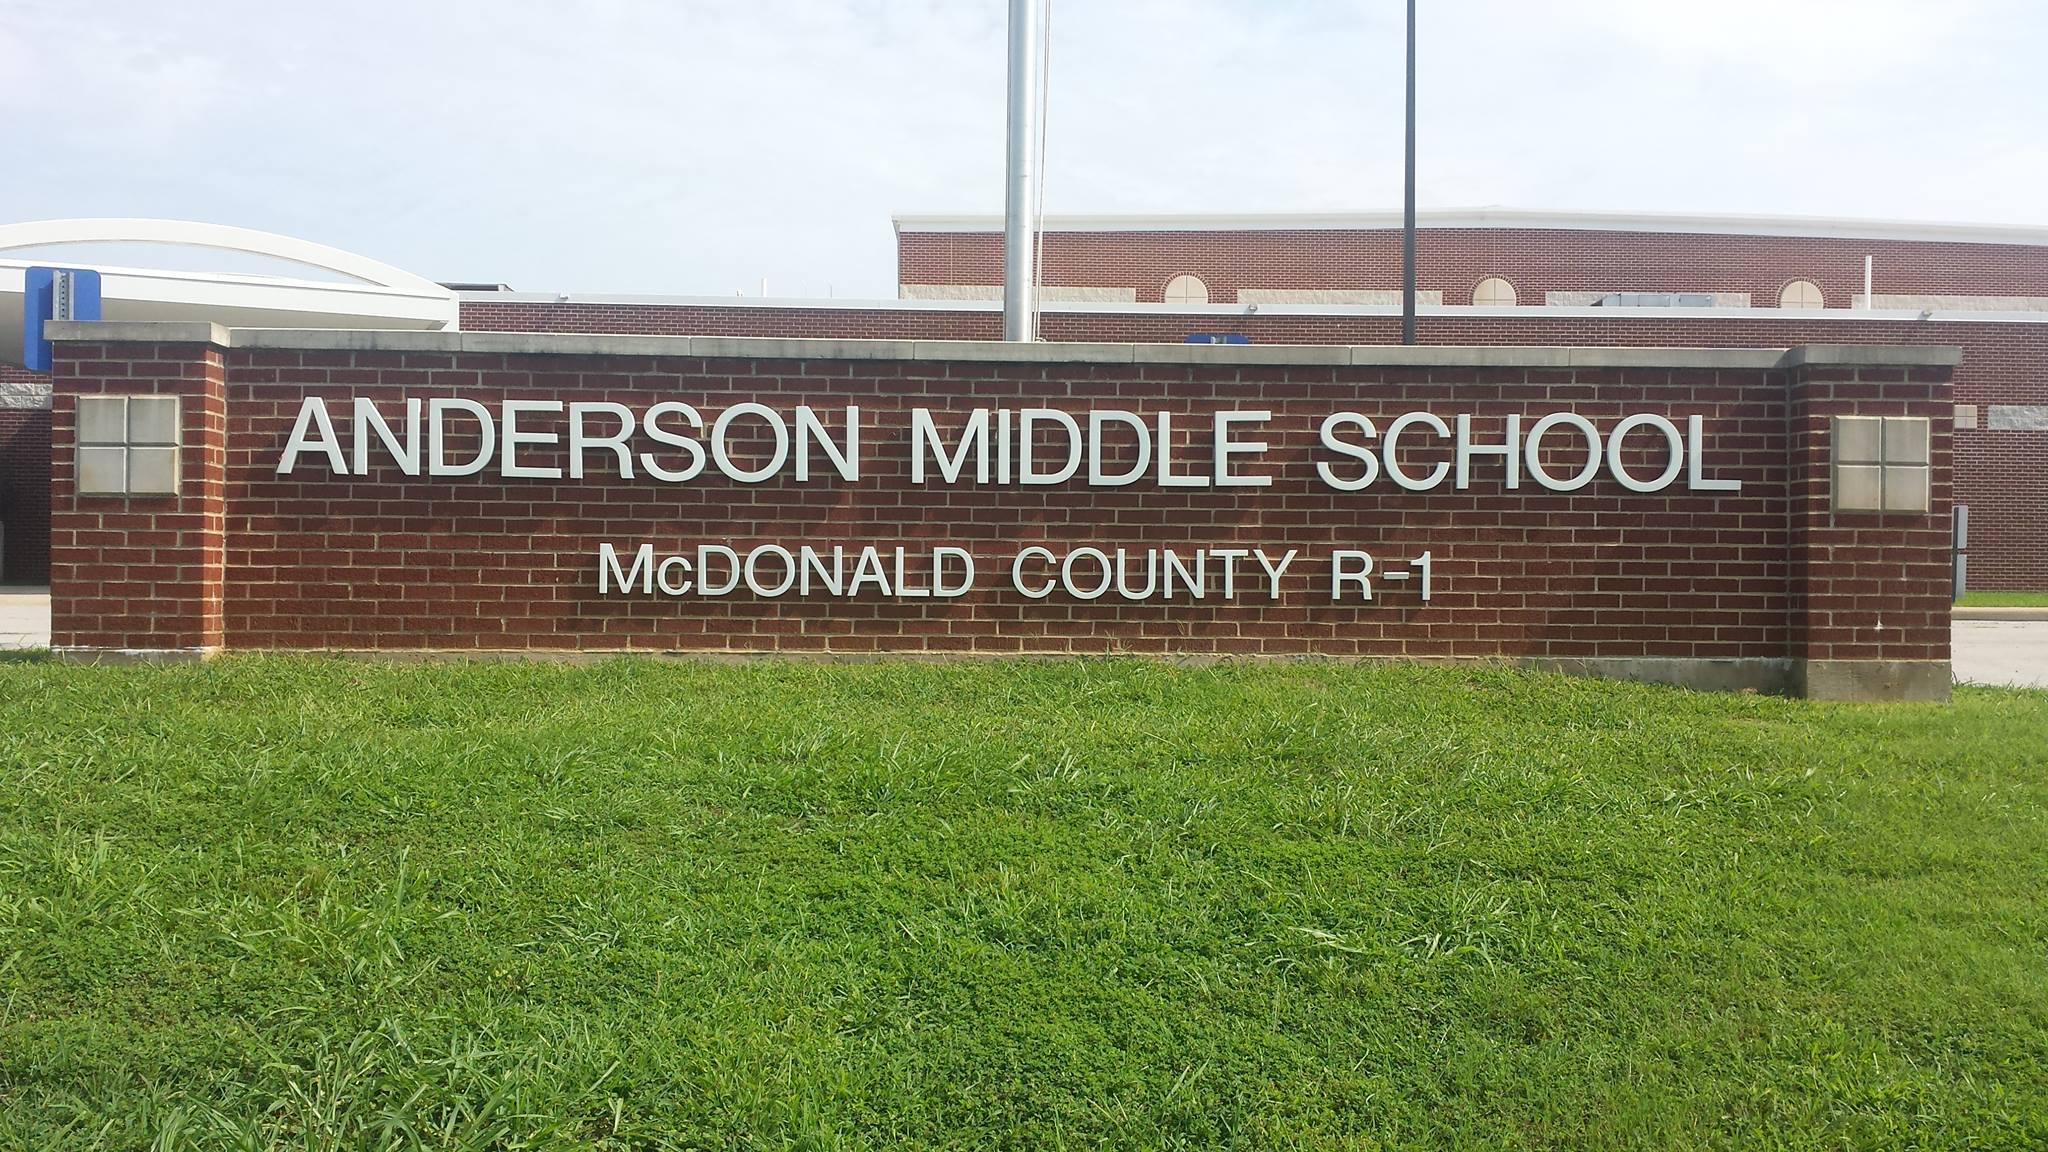 Anderson Middle School